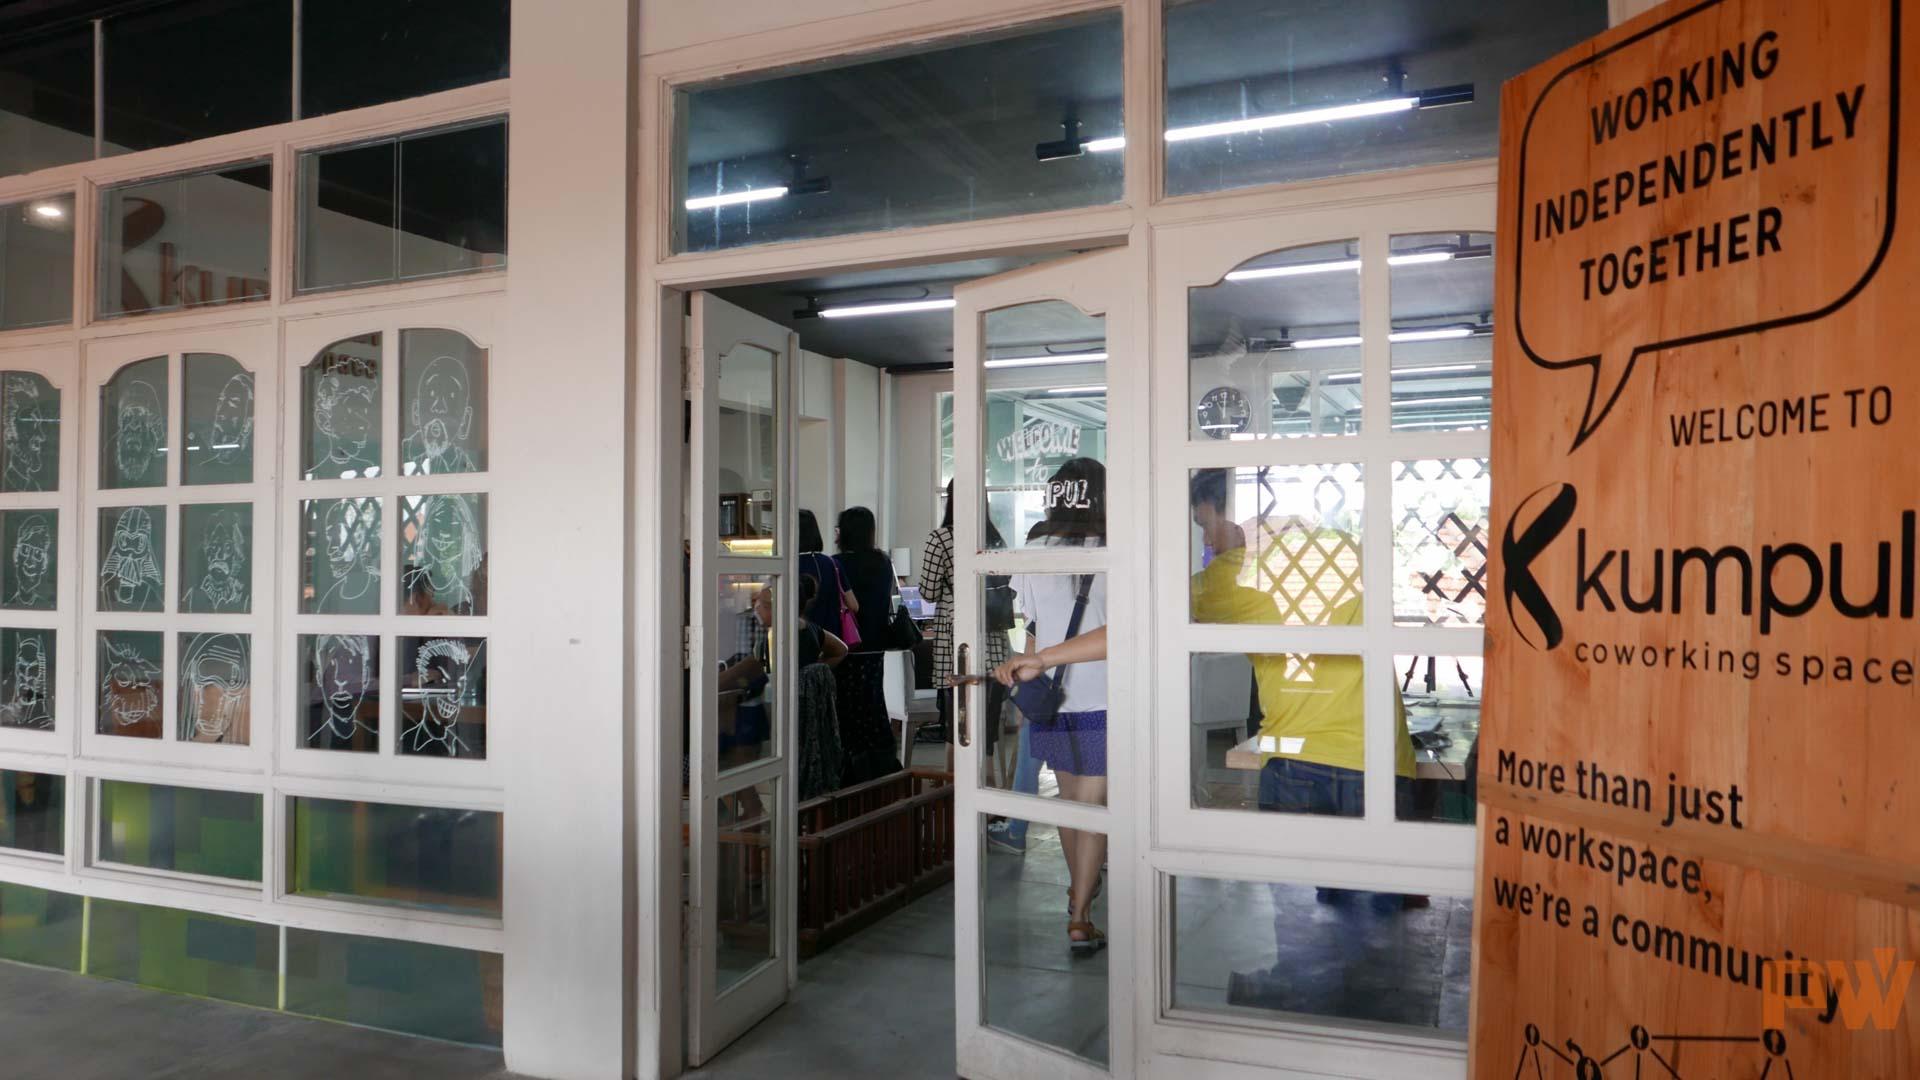 Uber 巴厘岛的办公地点位于 Kumpul 共享办公空间。/Photo by 郝影